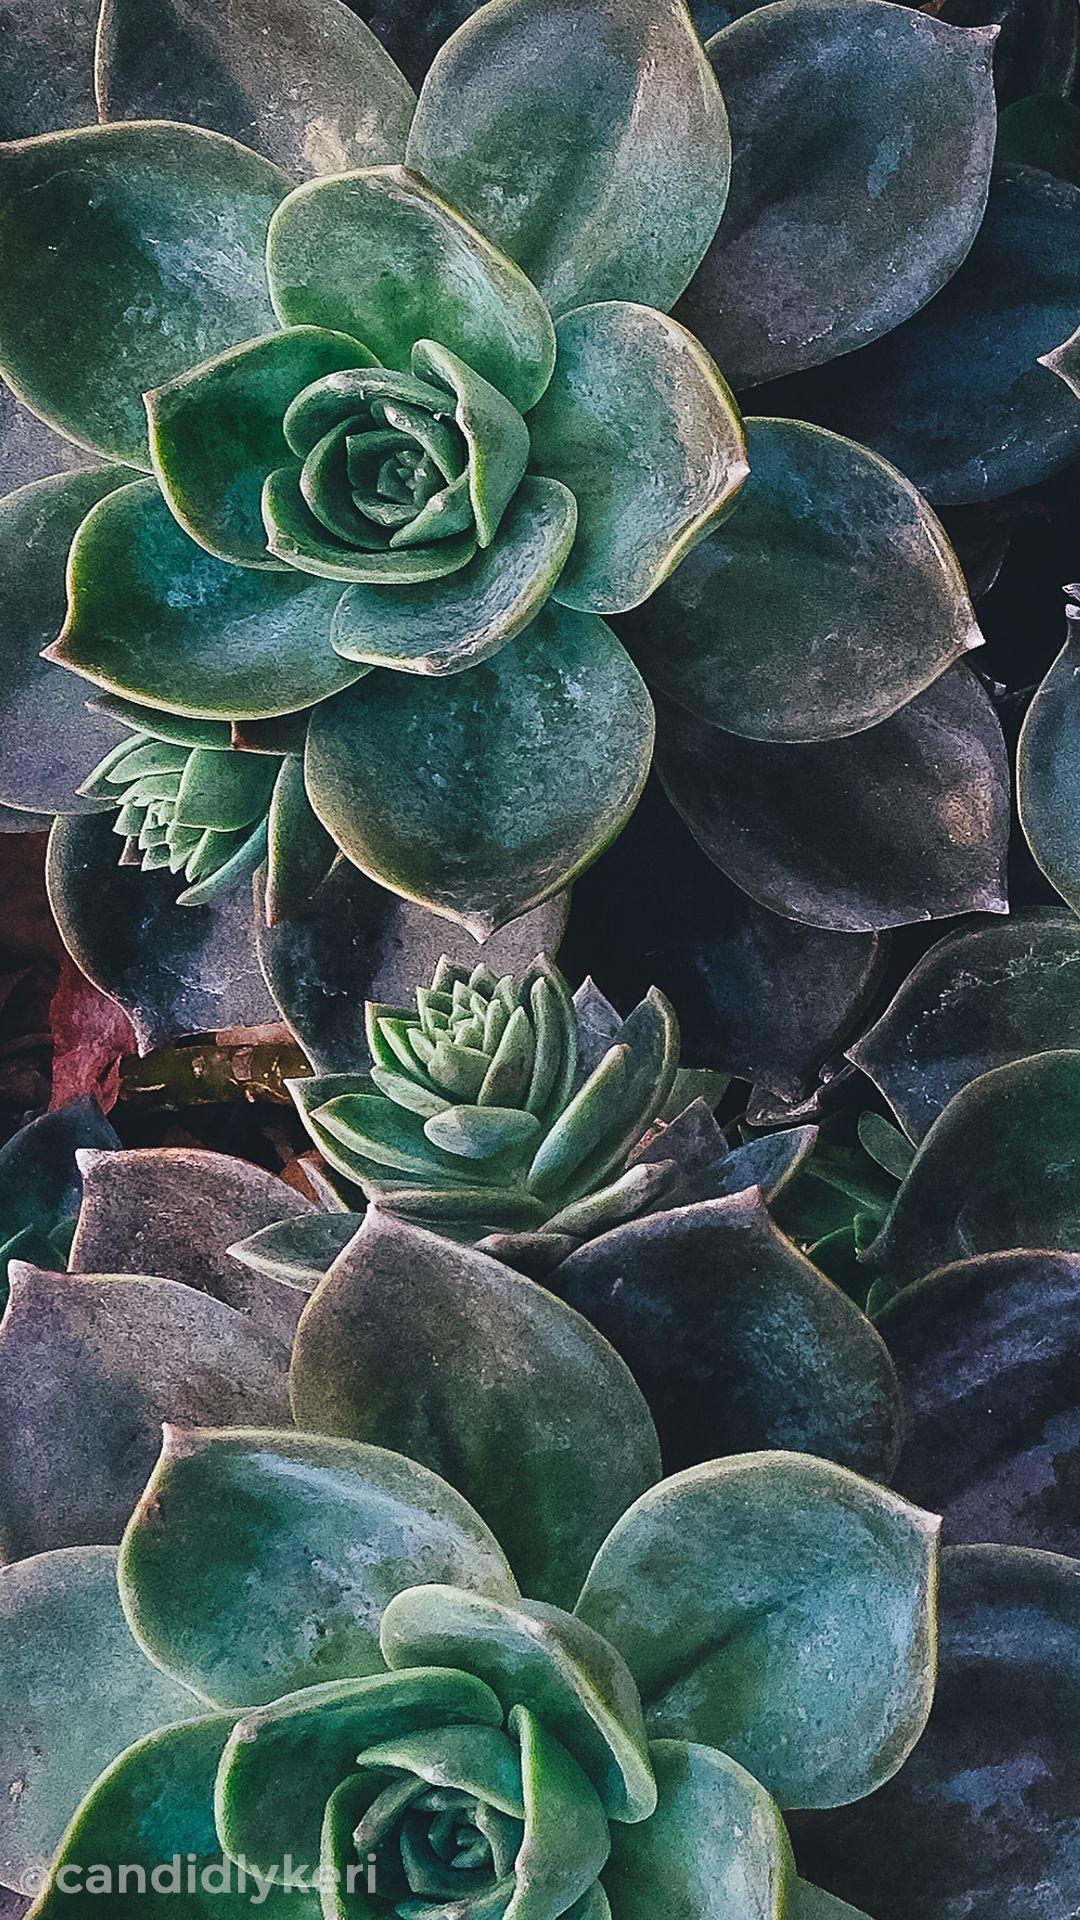 december28m | Wallpapers in 2019 | Succulents wallpaper, Mobile wallpaper, Fantastic wallpapers